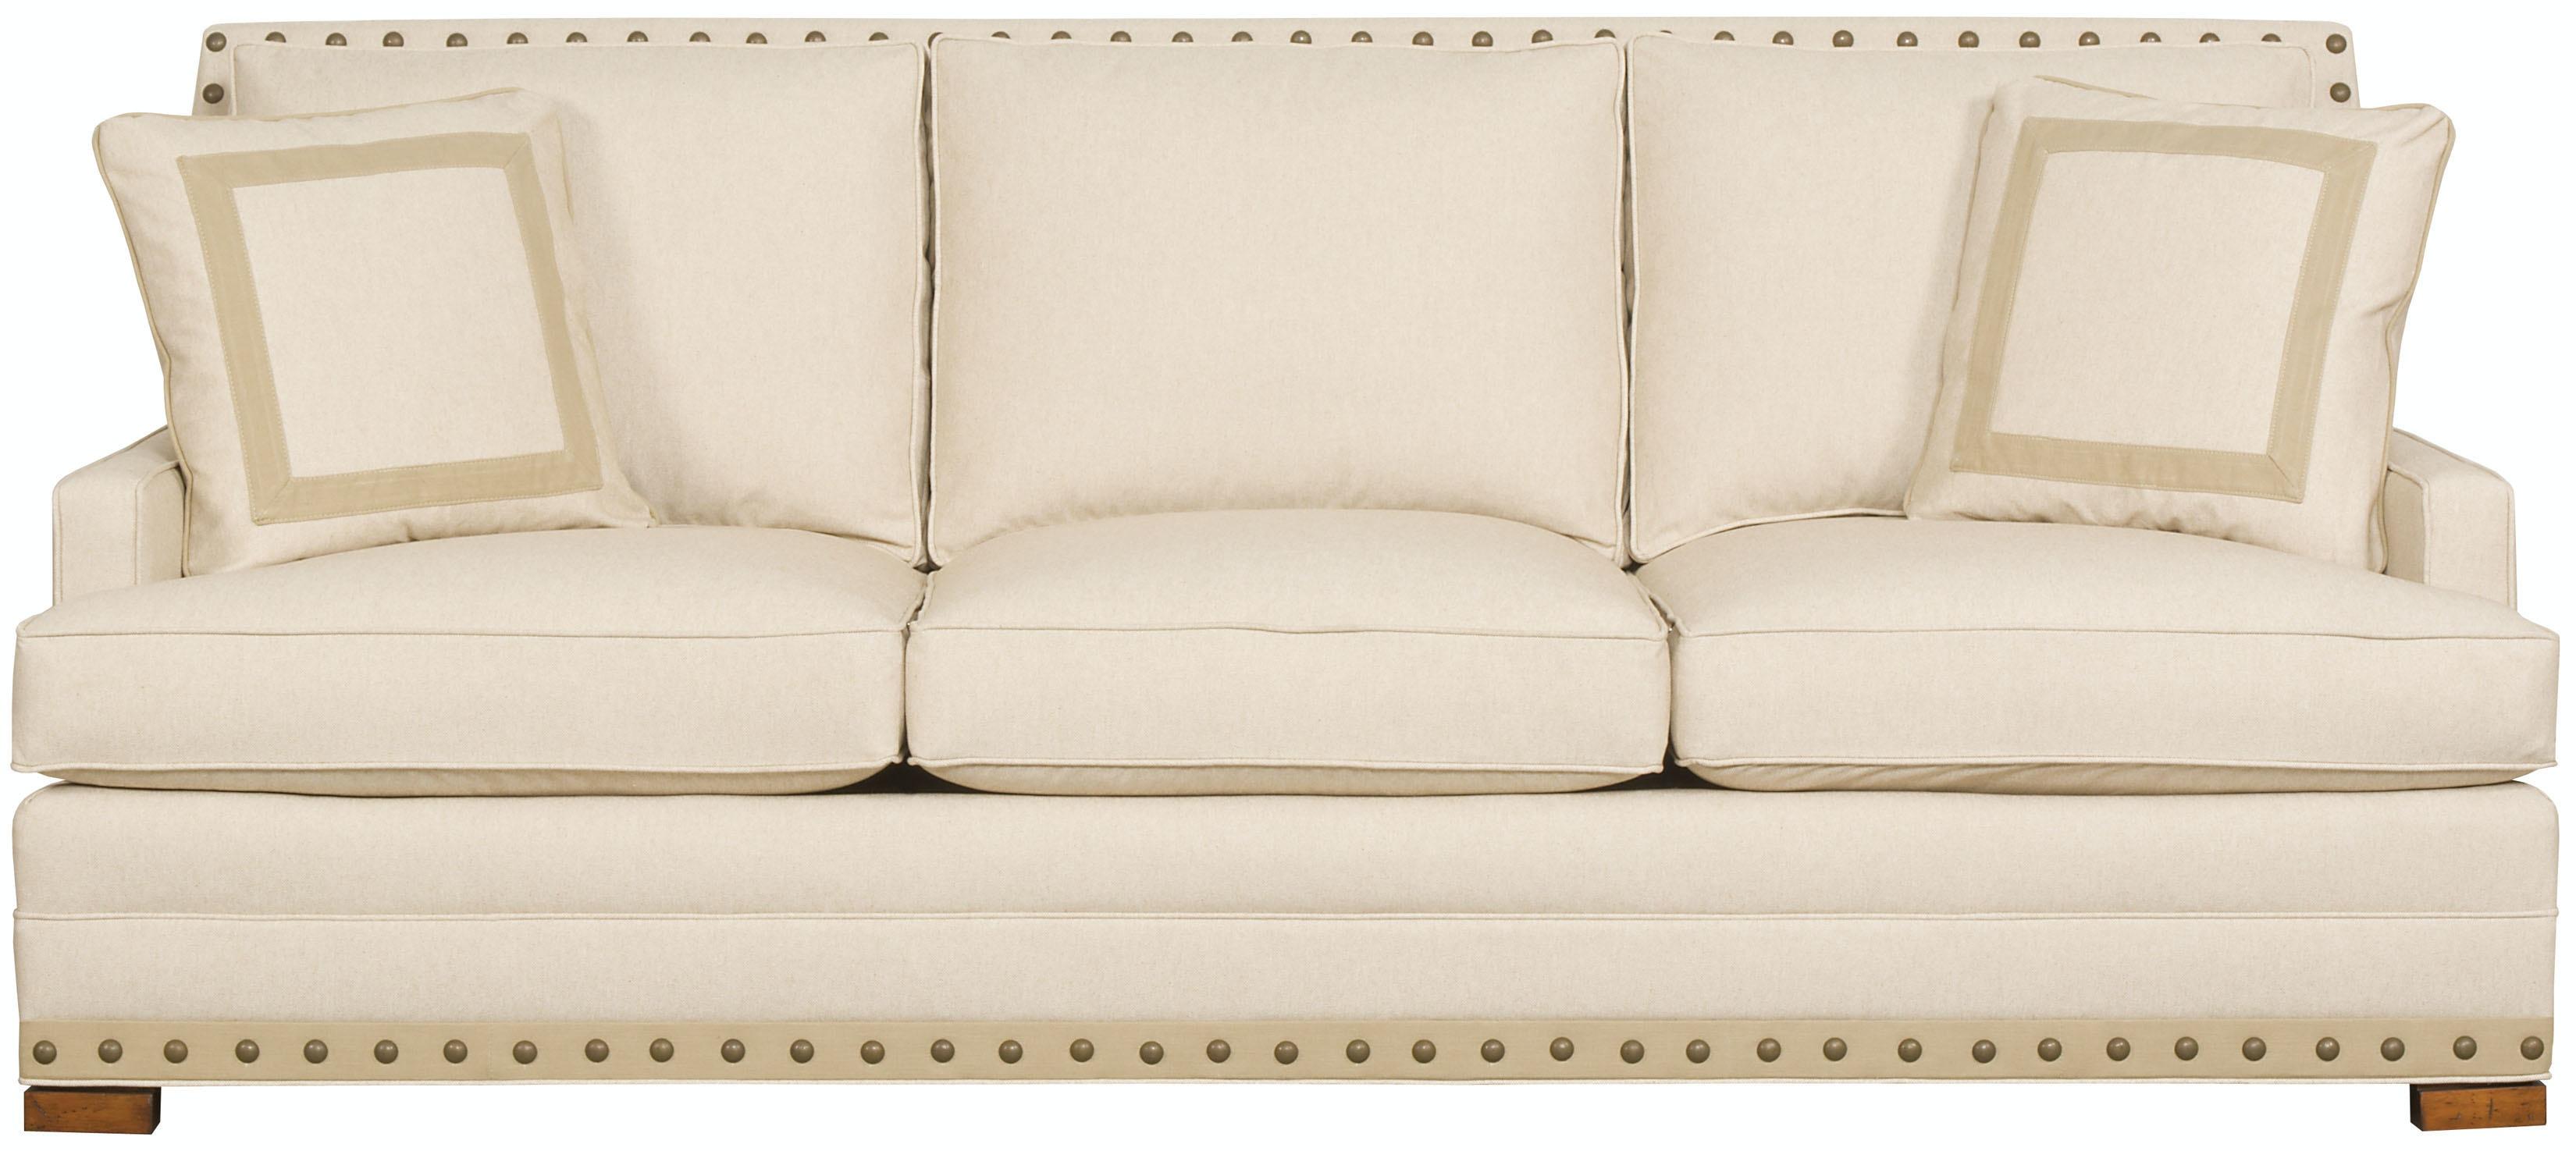 Vanguard Riverside Sofa 604 S